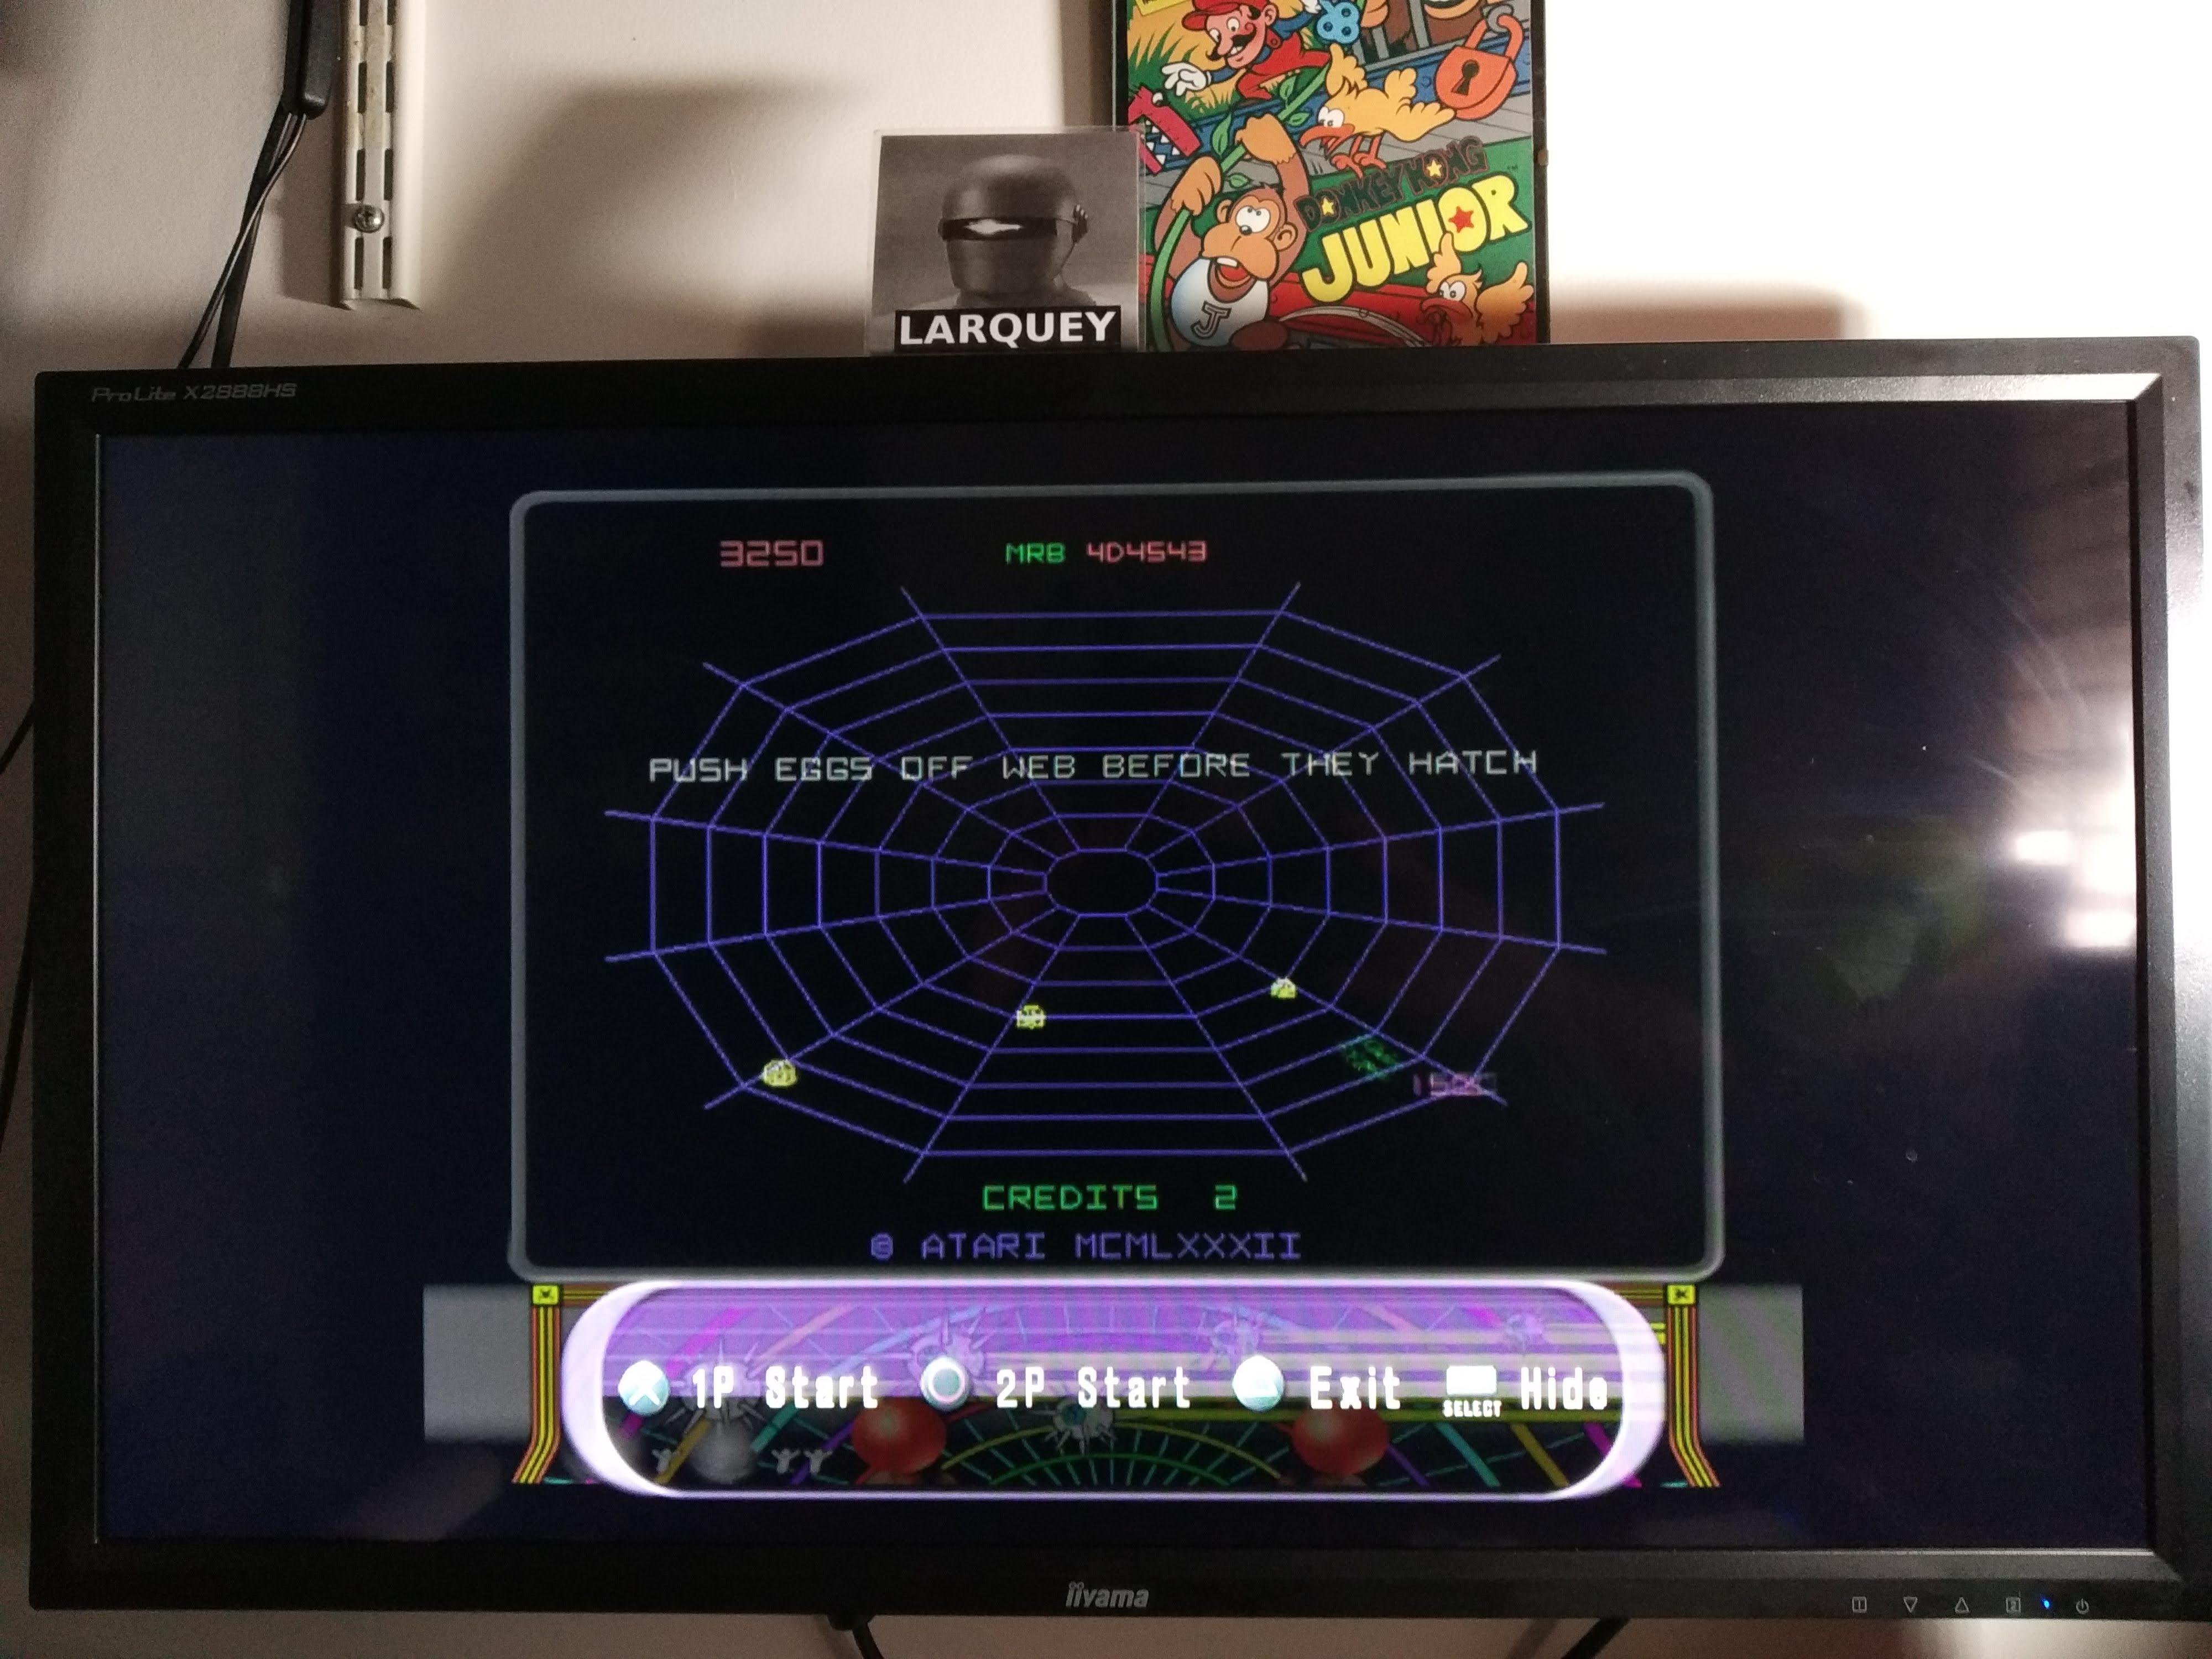 Larquey: Atari Anthology: Black Widow [Arcade Version] (Playstation 2 Emulated) 3,250 points on 2020-08-04 11:57:07